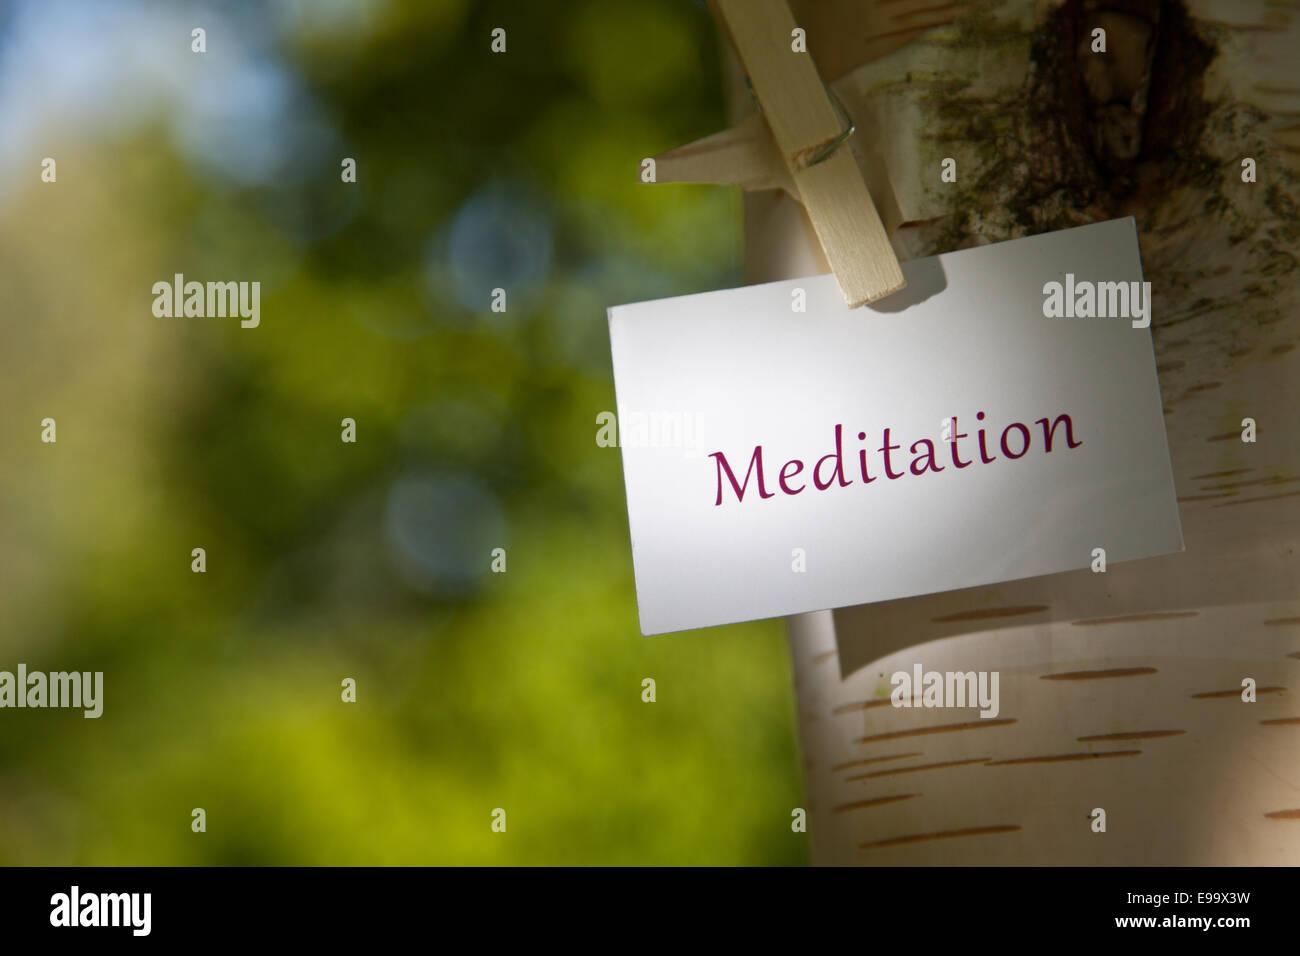 meditation paper